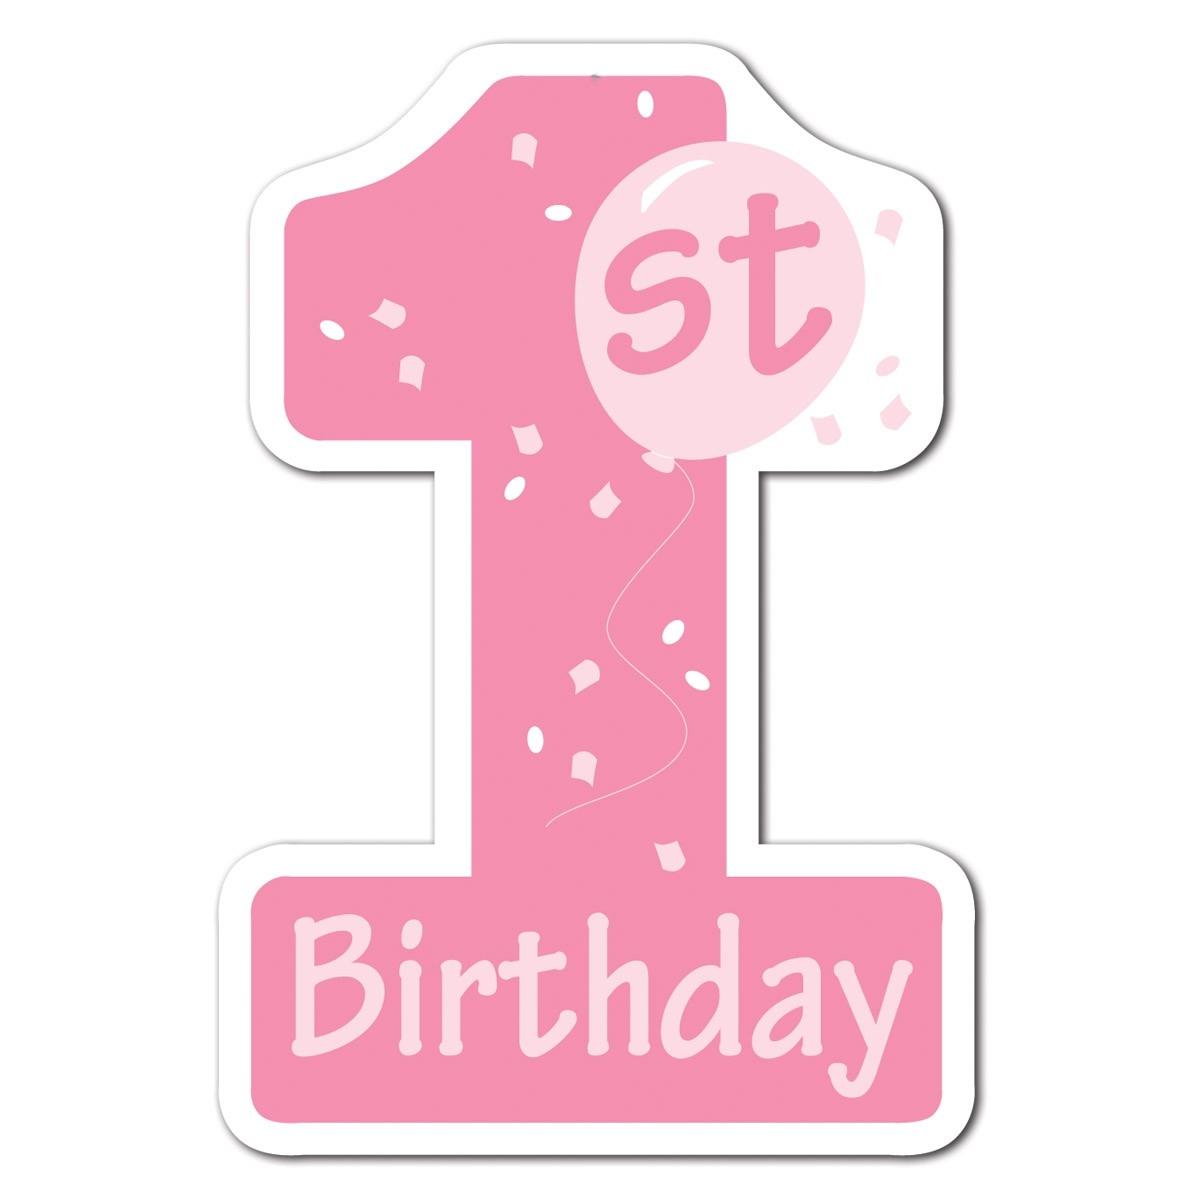 1st birthday clipart.